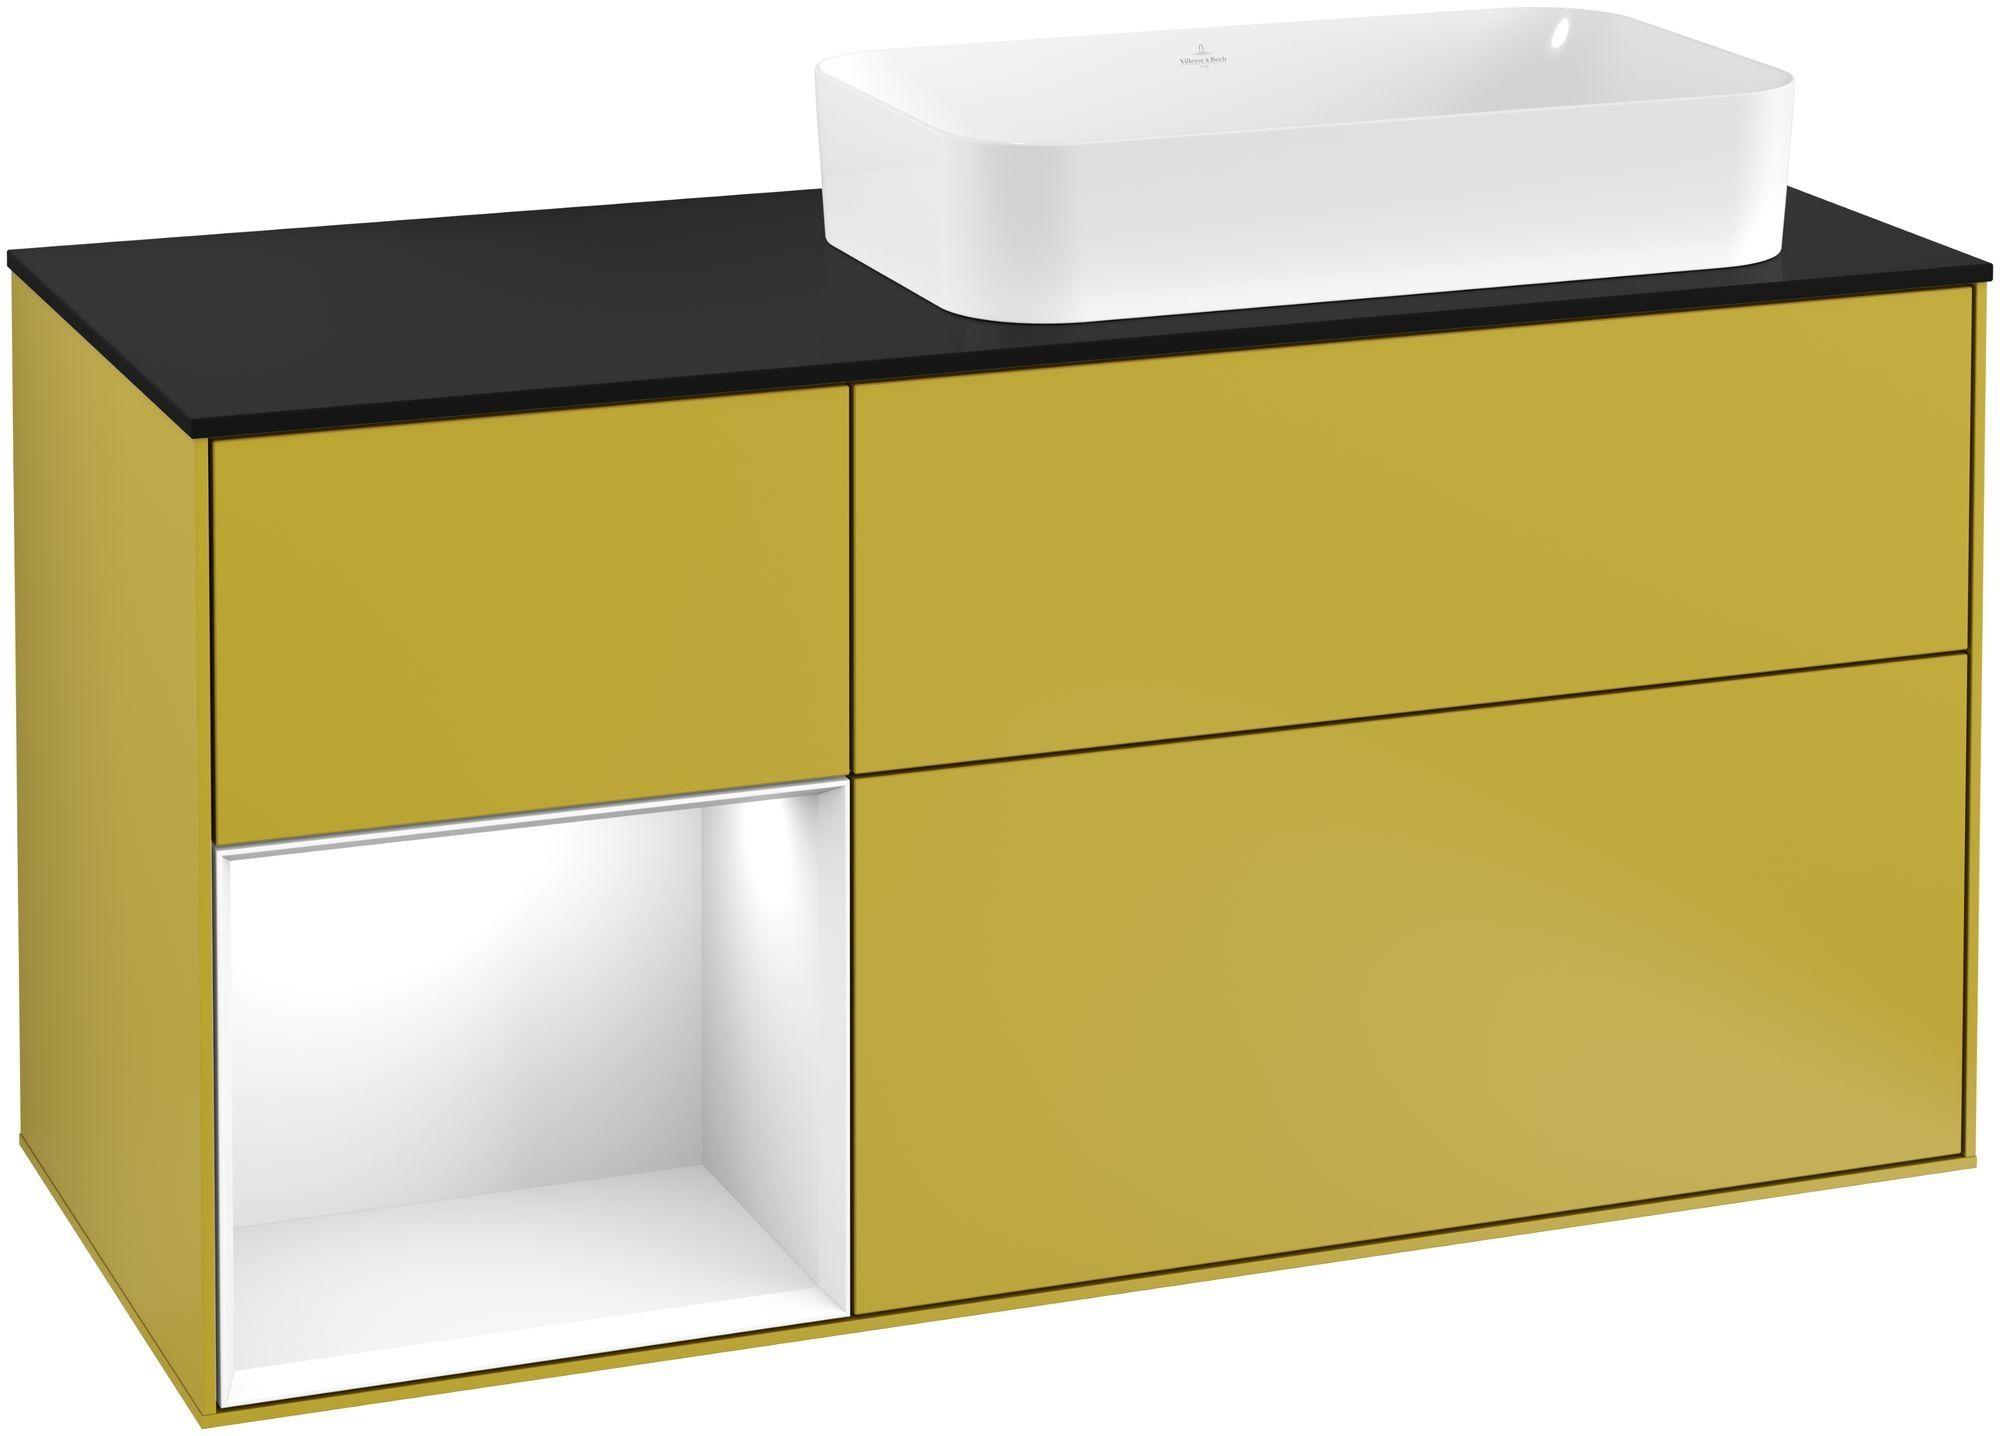 Villeroy & Boch Finion G27 Waschtischunterschrank mit Regalelement 3 Auszüge Waschtisch rechts LED-Beleuchtung B:120xH:60,3xT:50,1cm Front, Korpus: Sun, Regal: Glossy White Lack, Glasplatte: Black Matt G272GFHE